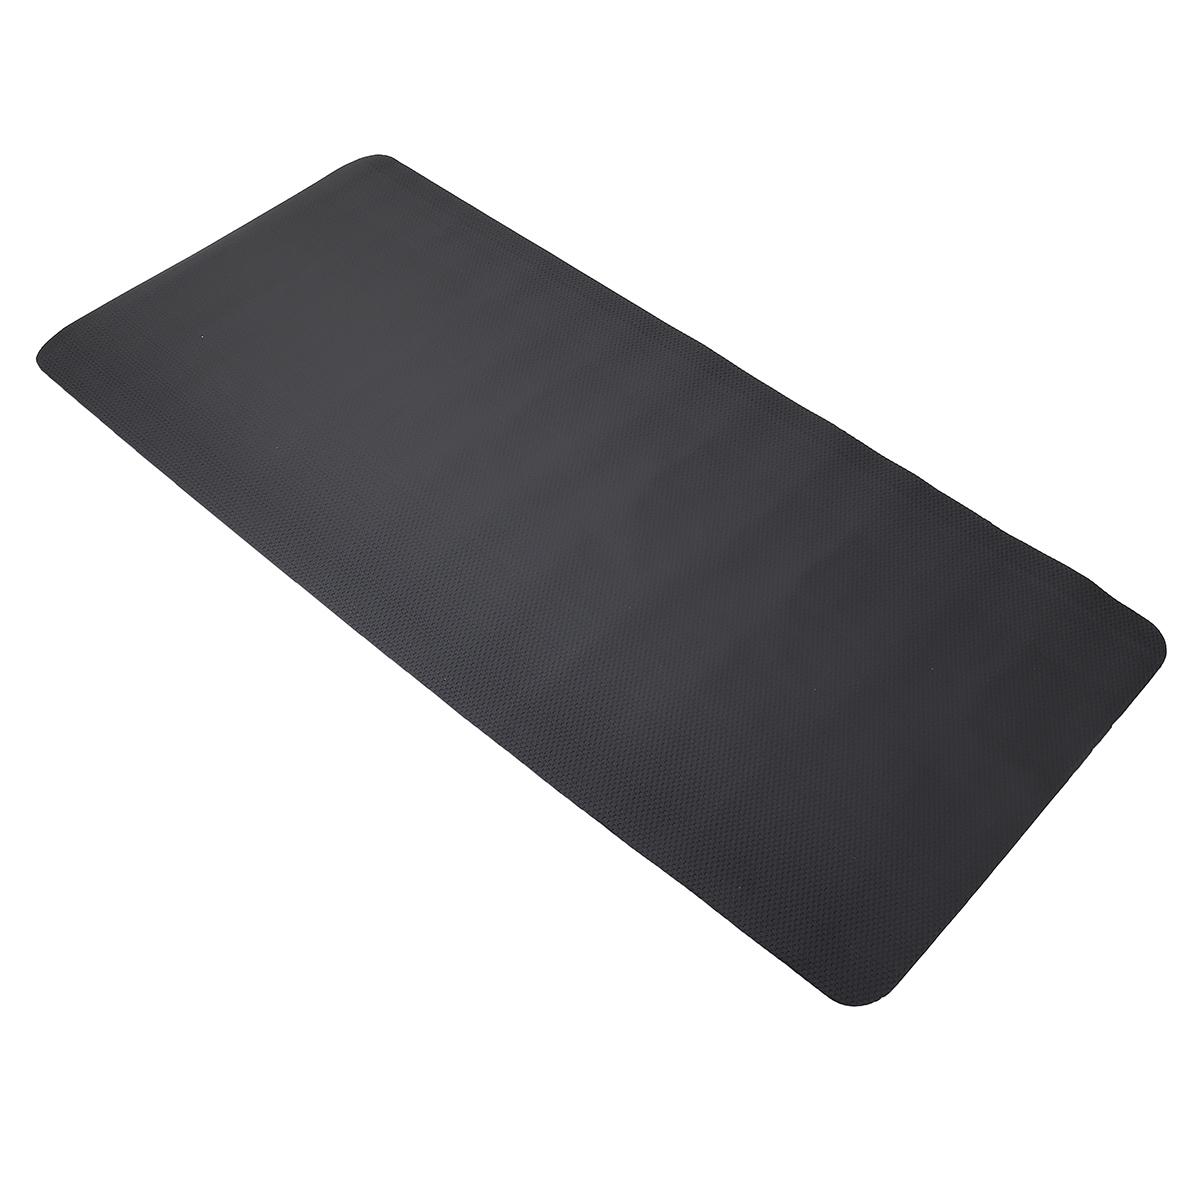 180x75cm Exercise Mat Yoga Mats Gym Equipment Pad For Treadmill Protect Floor